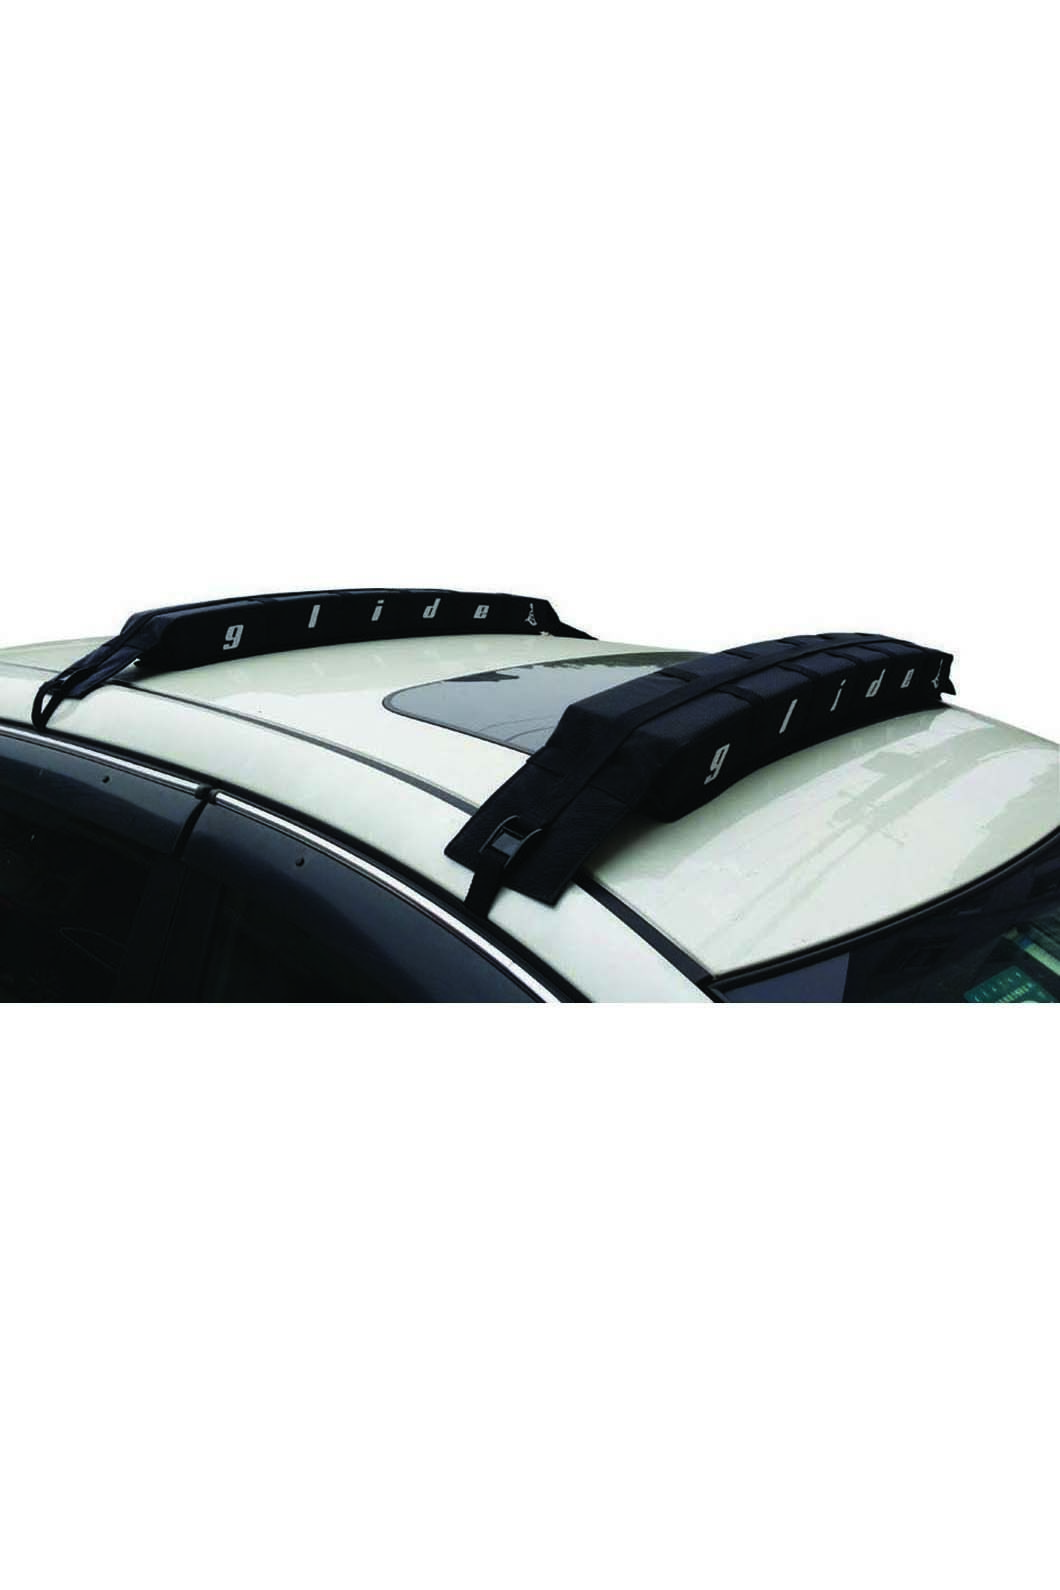 Glide Soft Roof Racks, None, hi-res